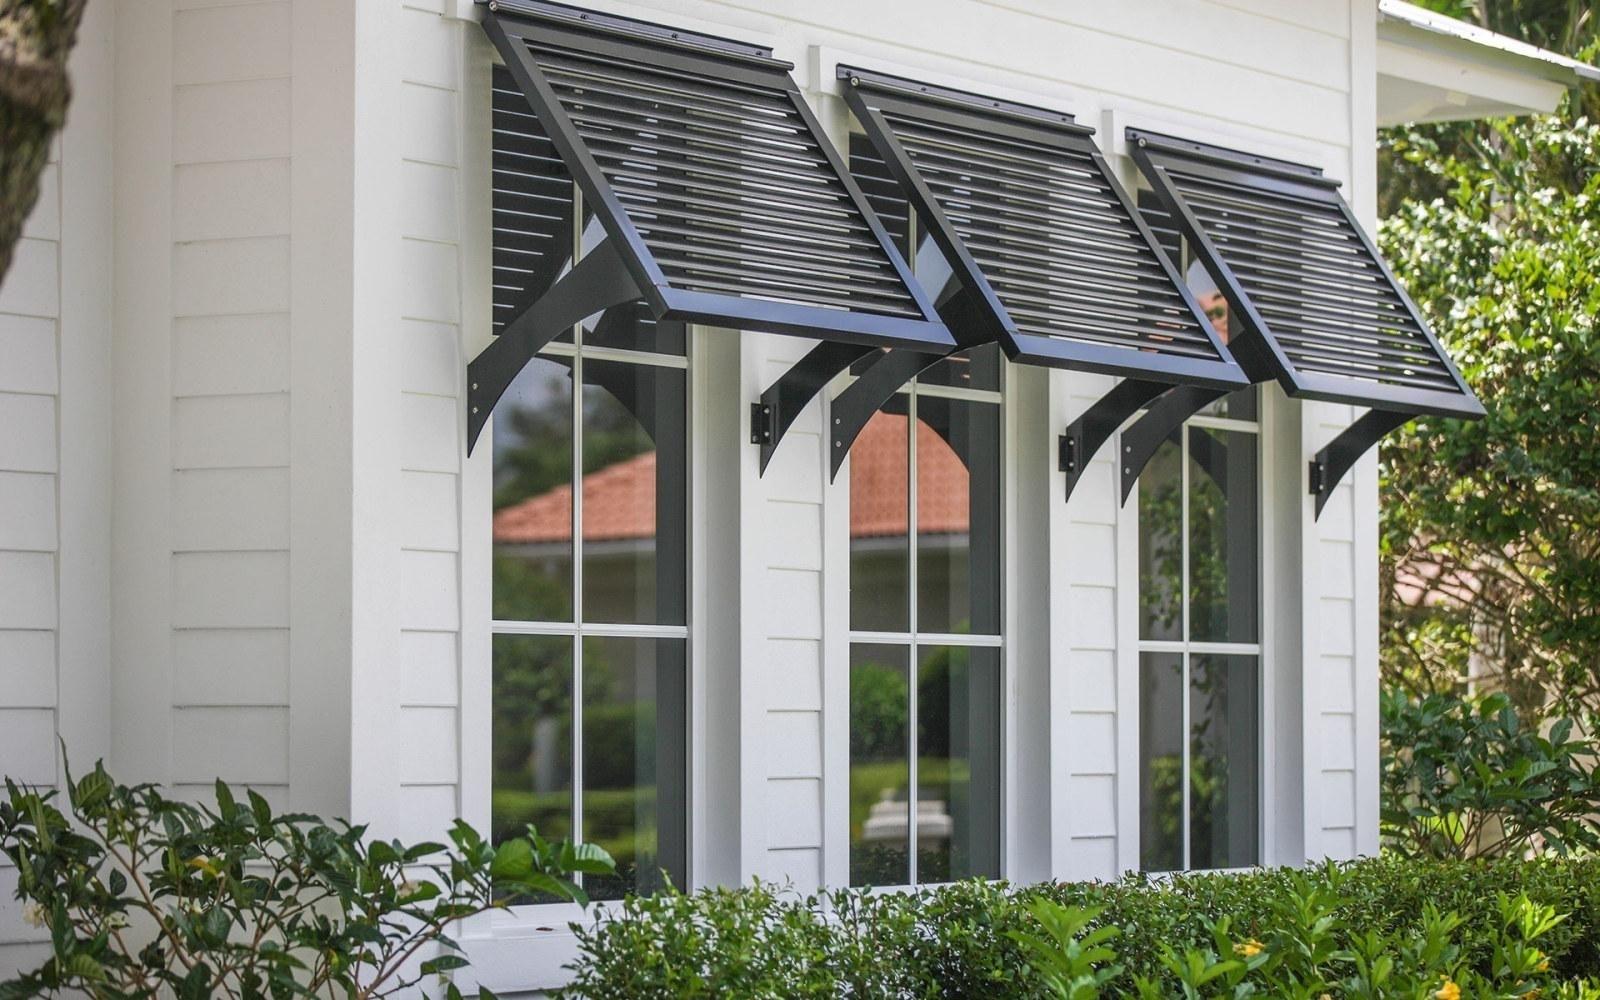 Metal Exterior Shutters For Windows Madison Art Center